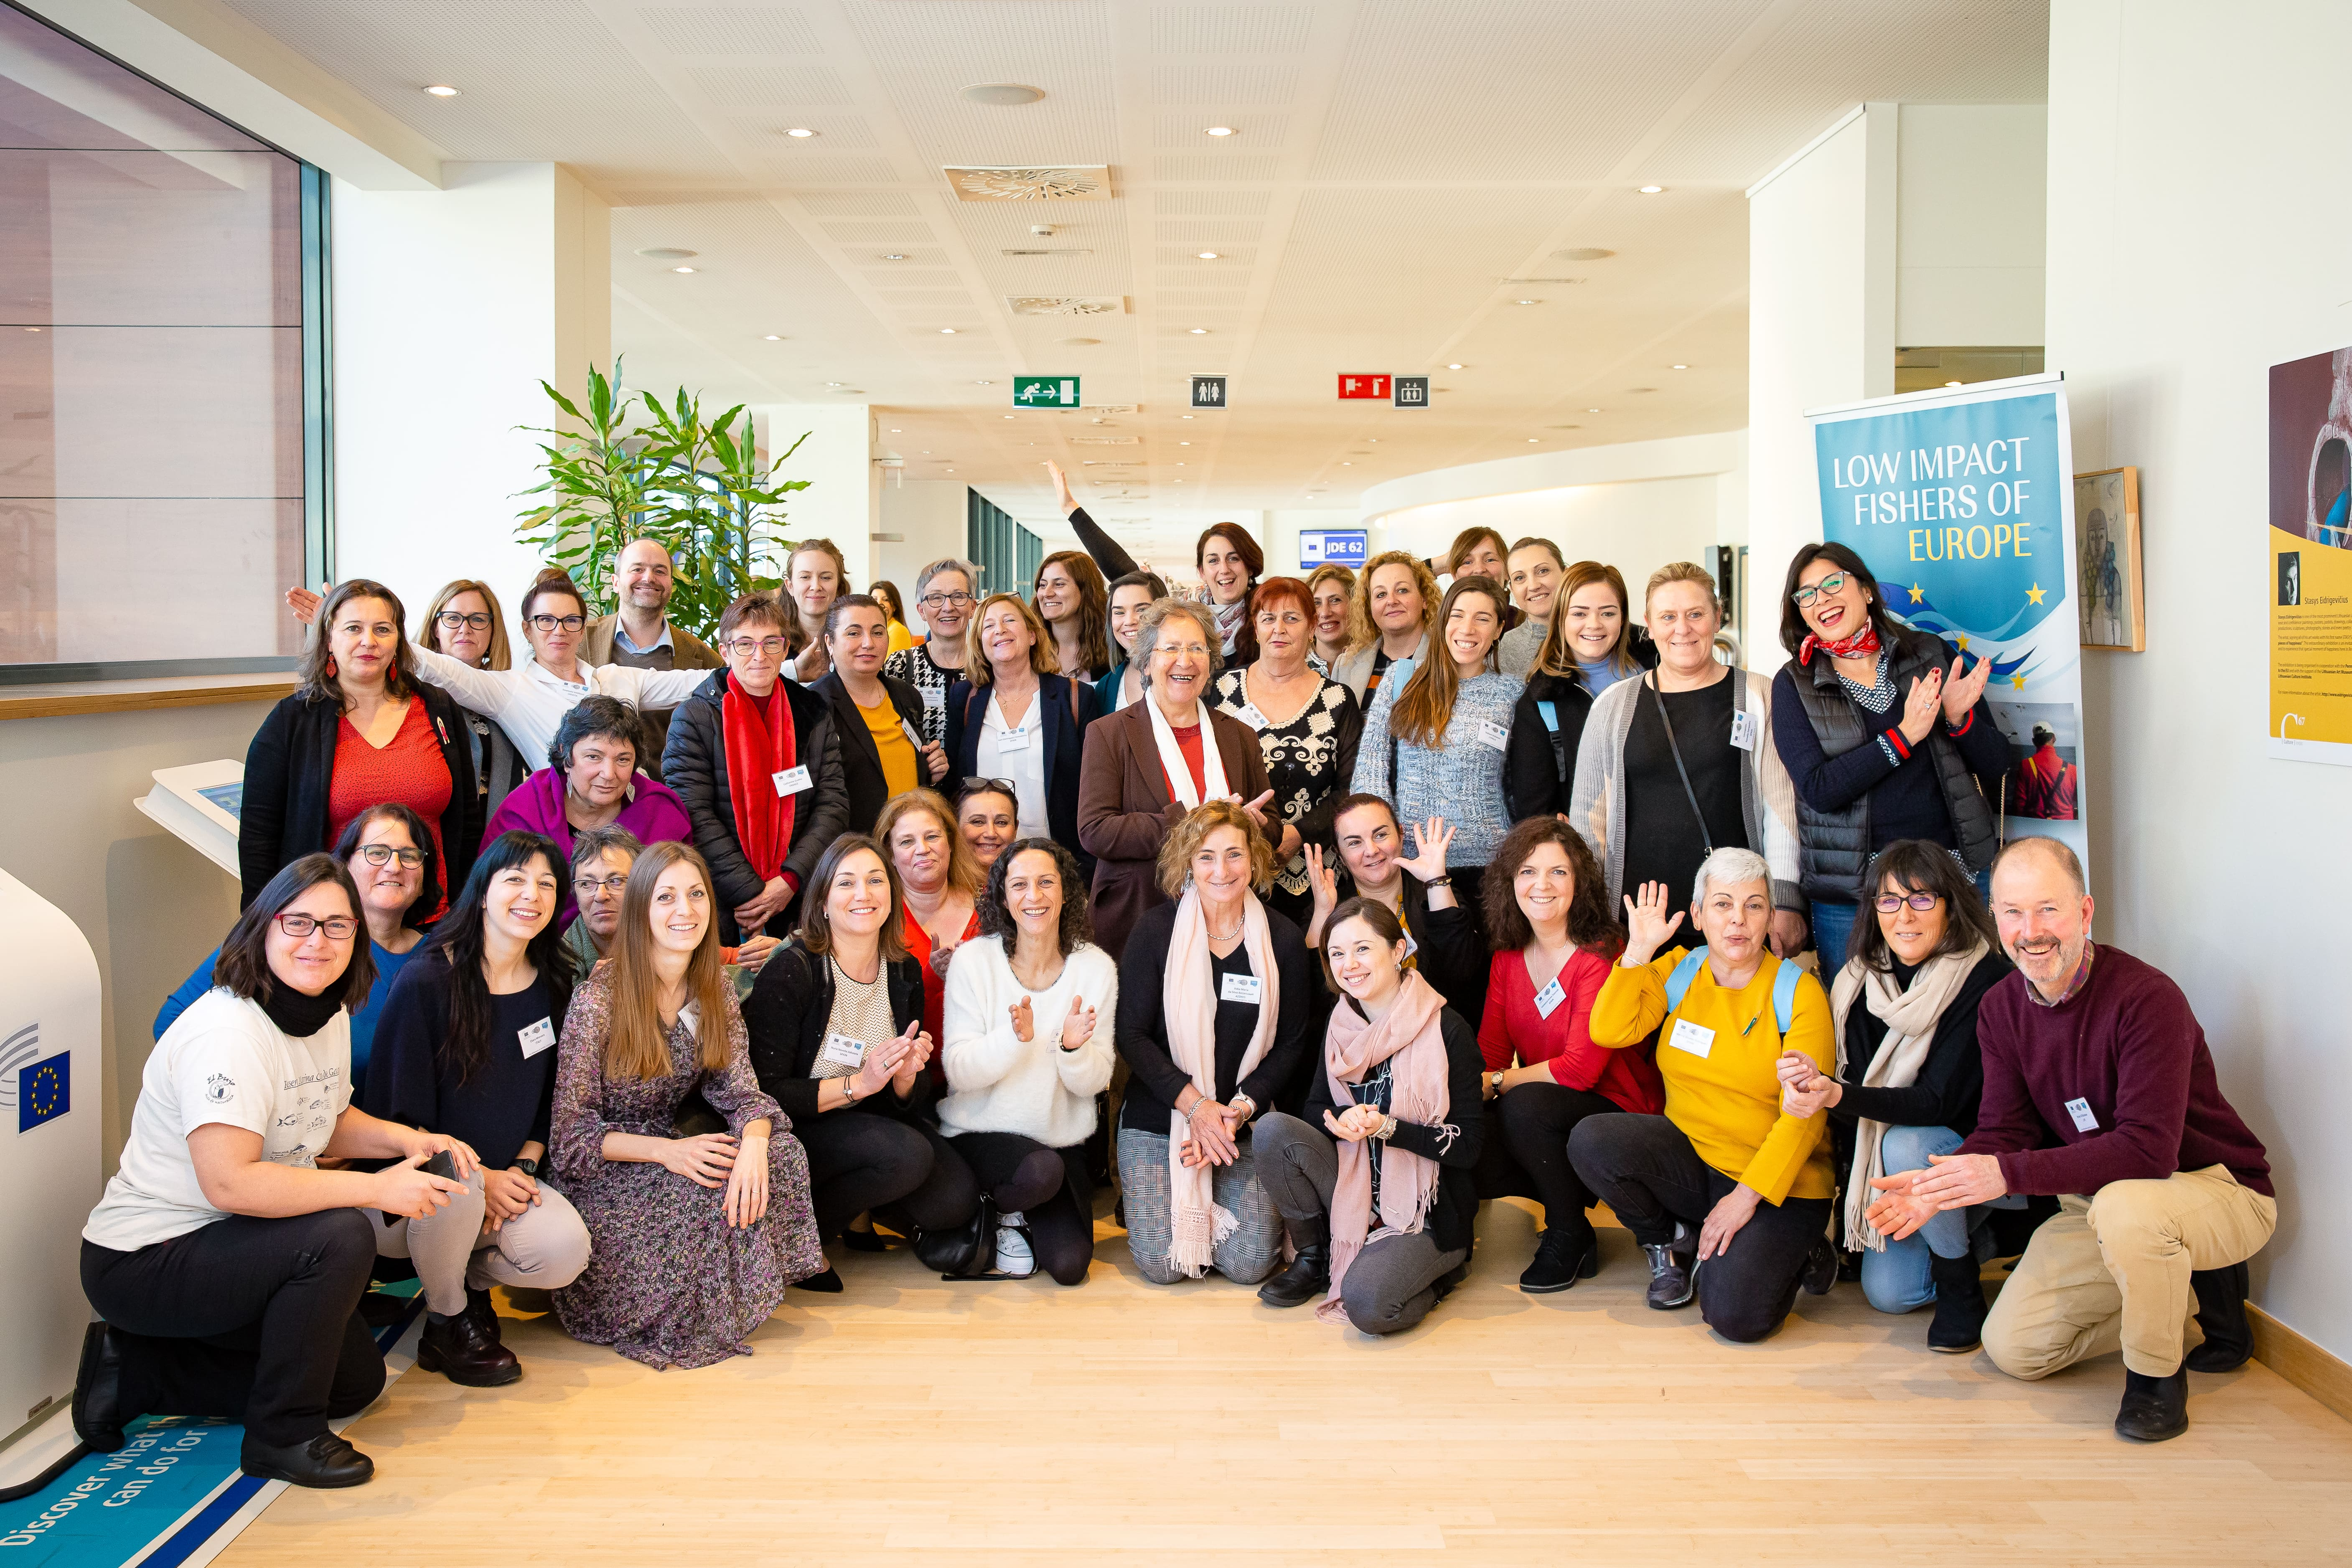 AKTEA's women conquer Brussels